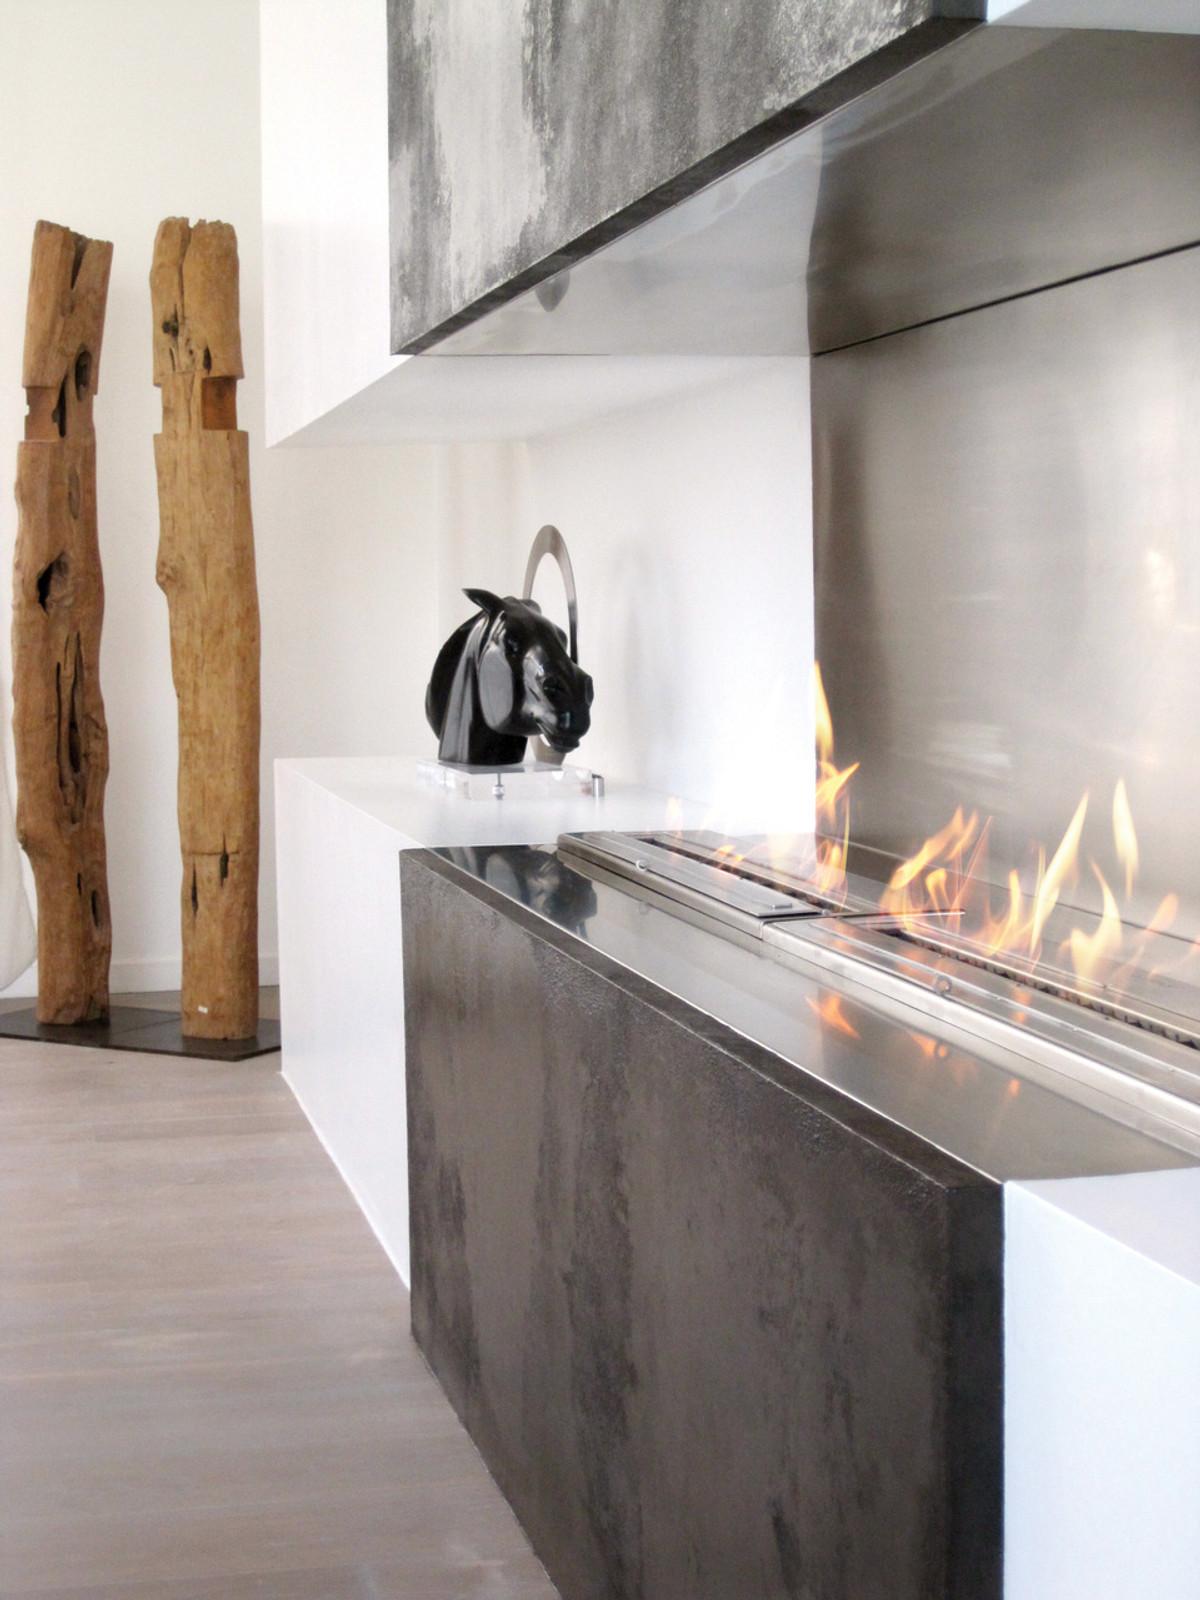 Burner - XL 900 - 9 Litre